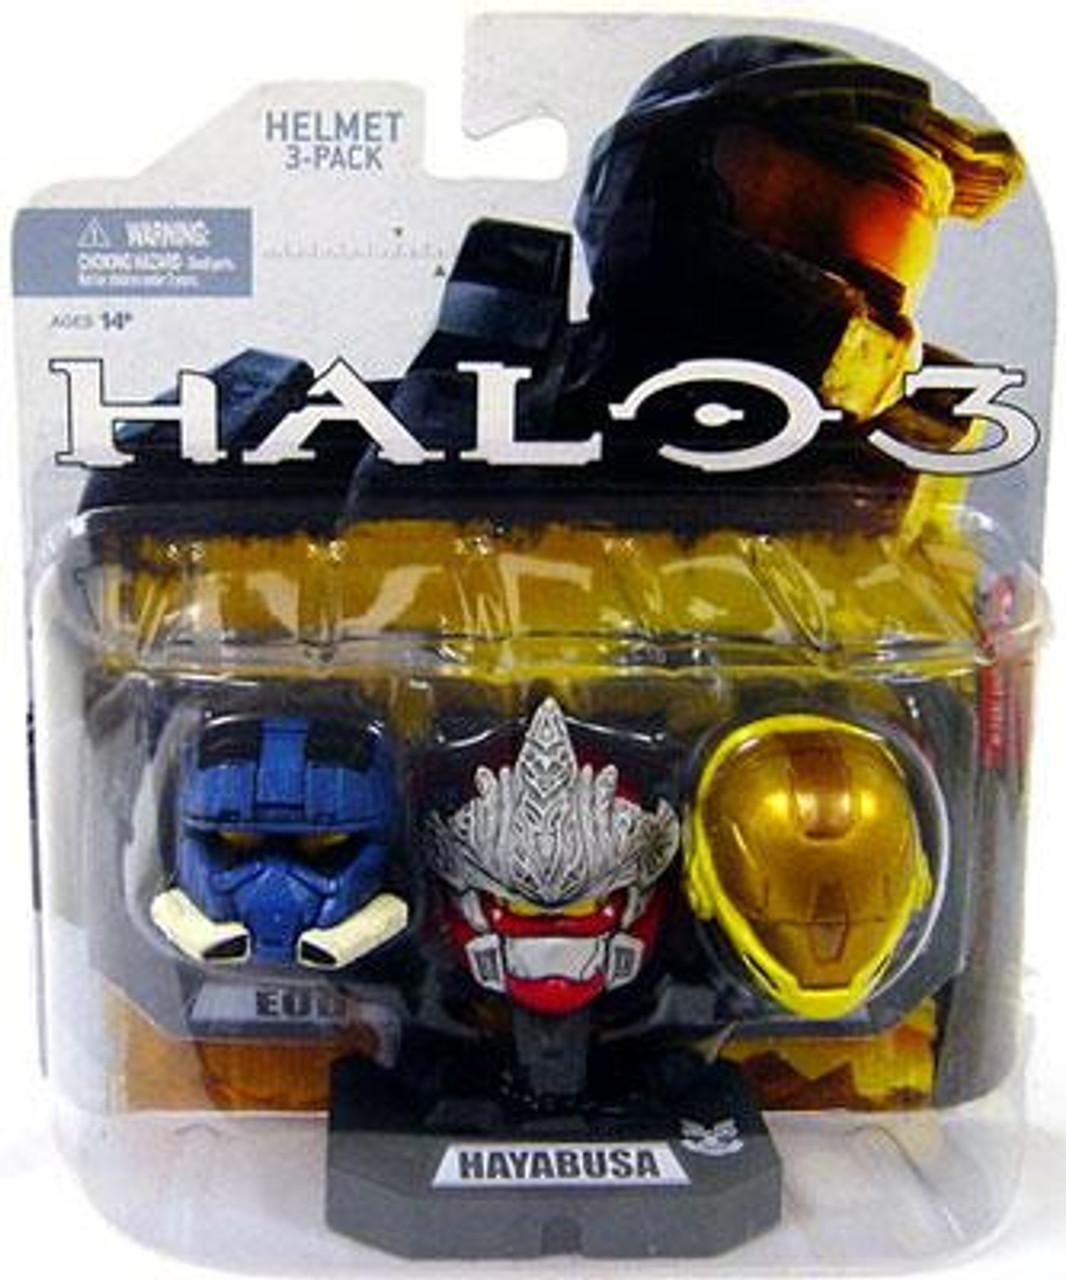 McFarlane Toys Halo Wave 1 Includes EOD, Hayabusa & EVA 12-Inch Helmet 3-Pack